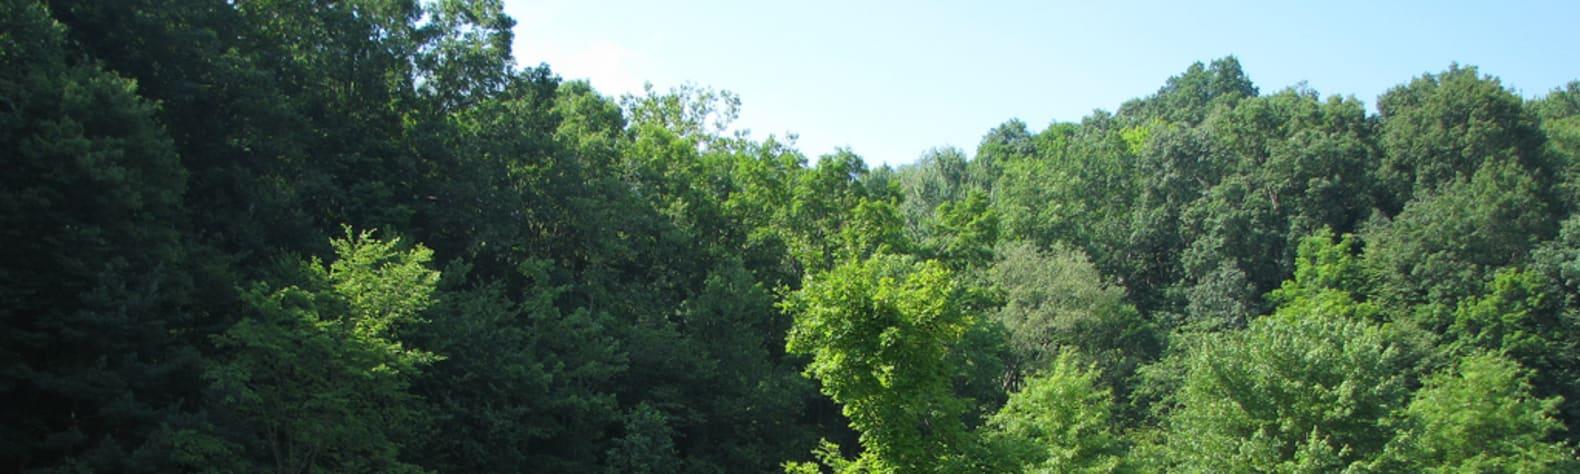 Raccoon Creek State Park